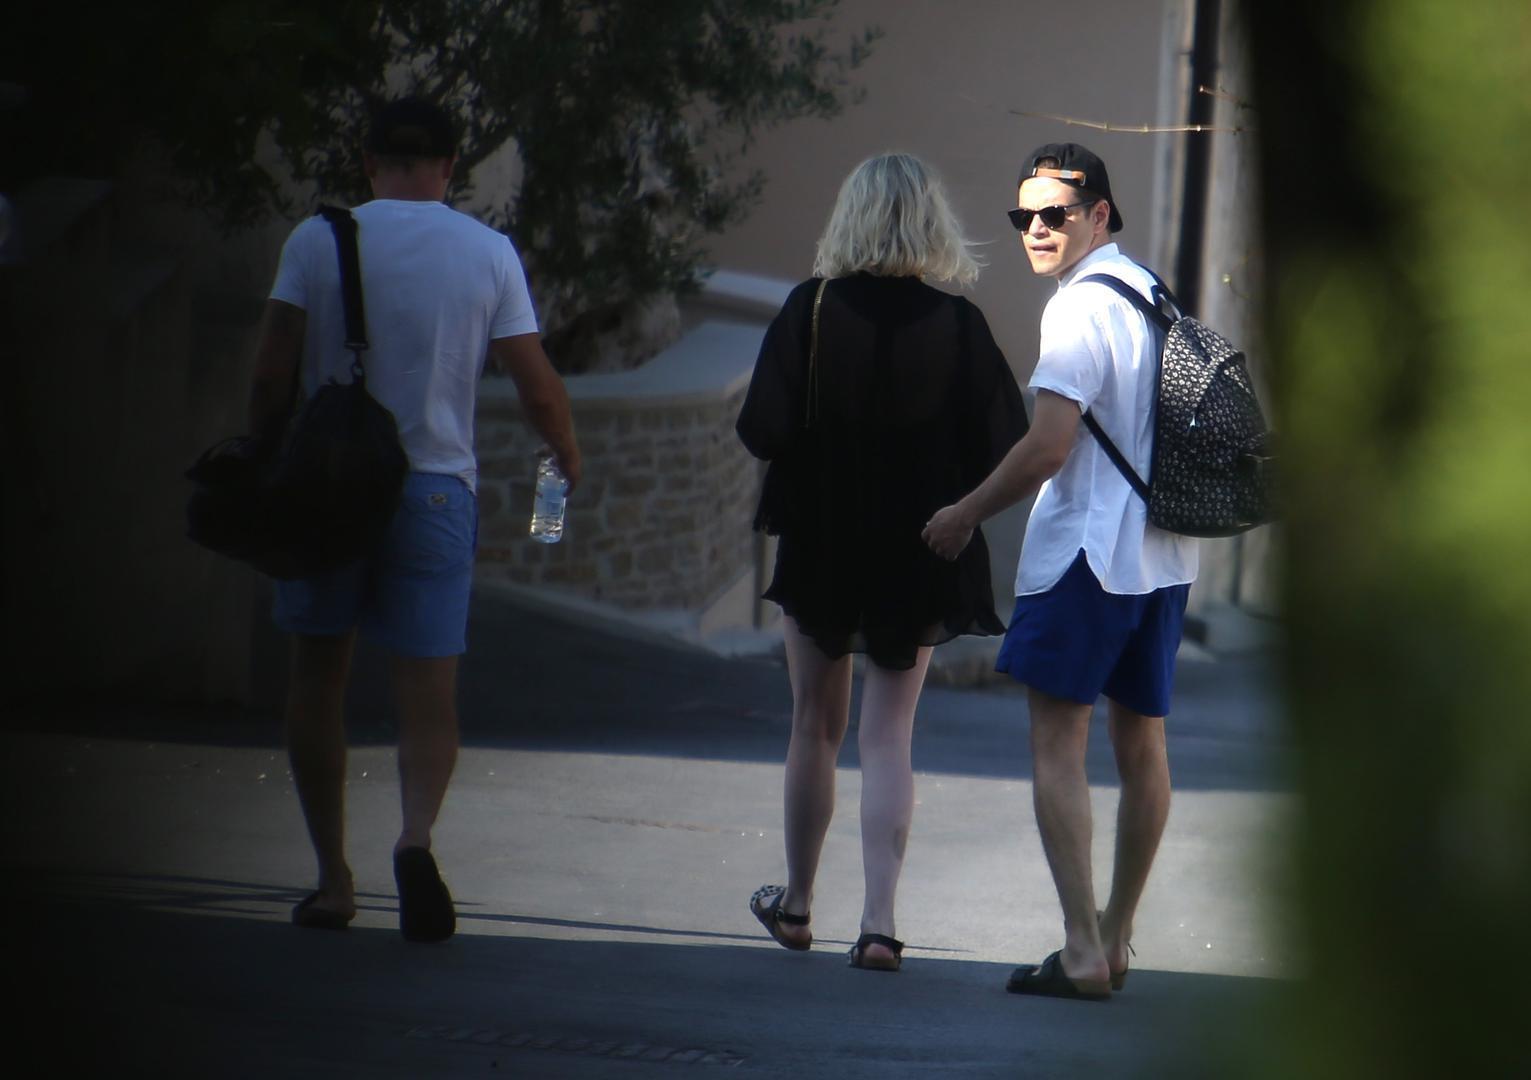 Actor Rami Malek con su novia en la isla Brac